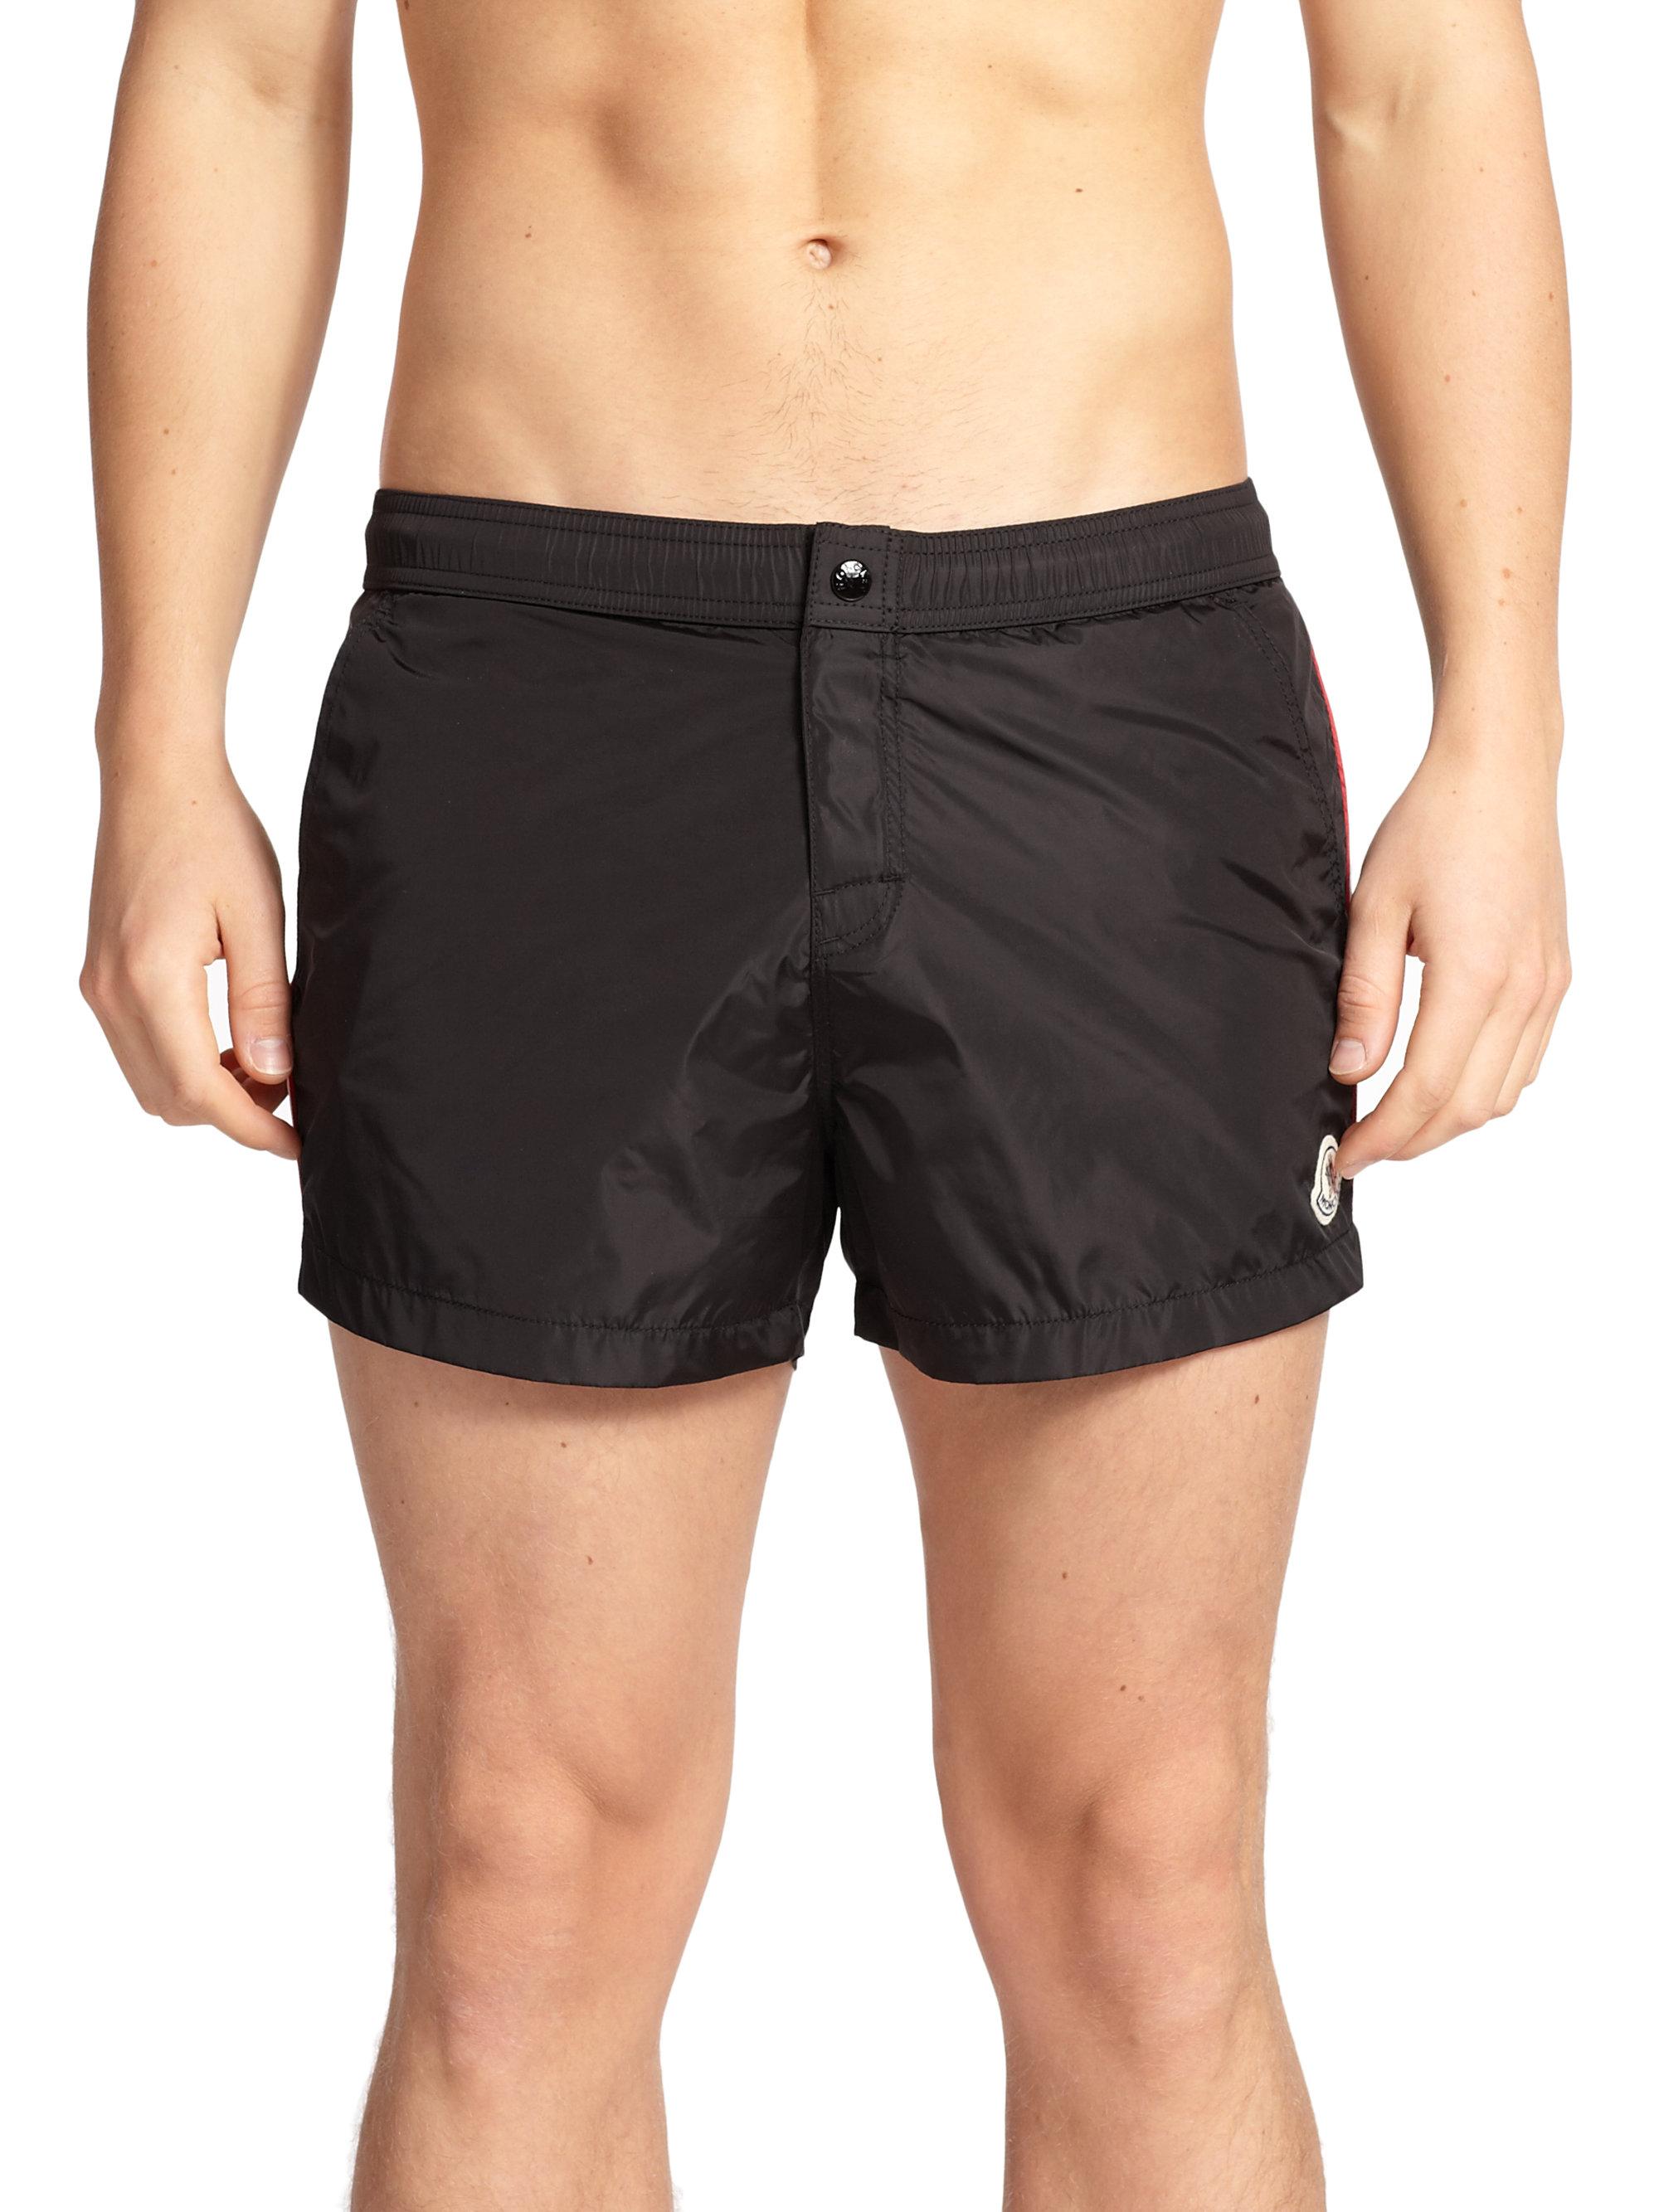 3b0c548a1a Moncler Nylon Swim Shorts in Black for Men - Lyst